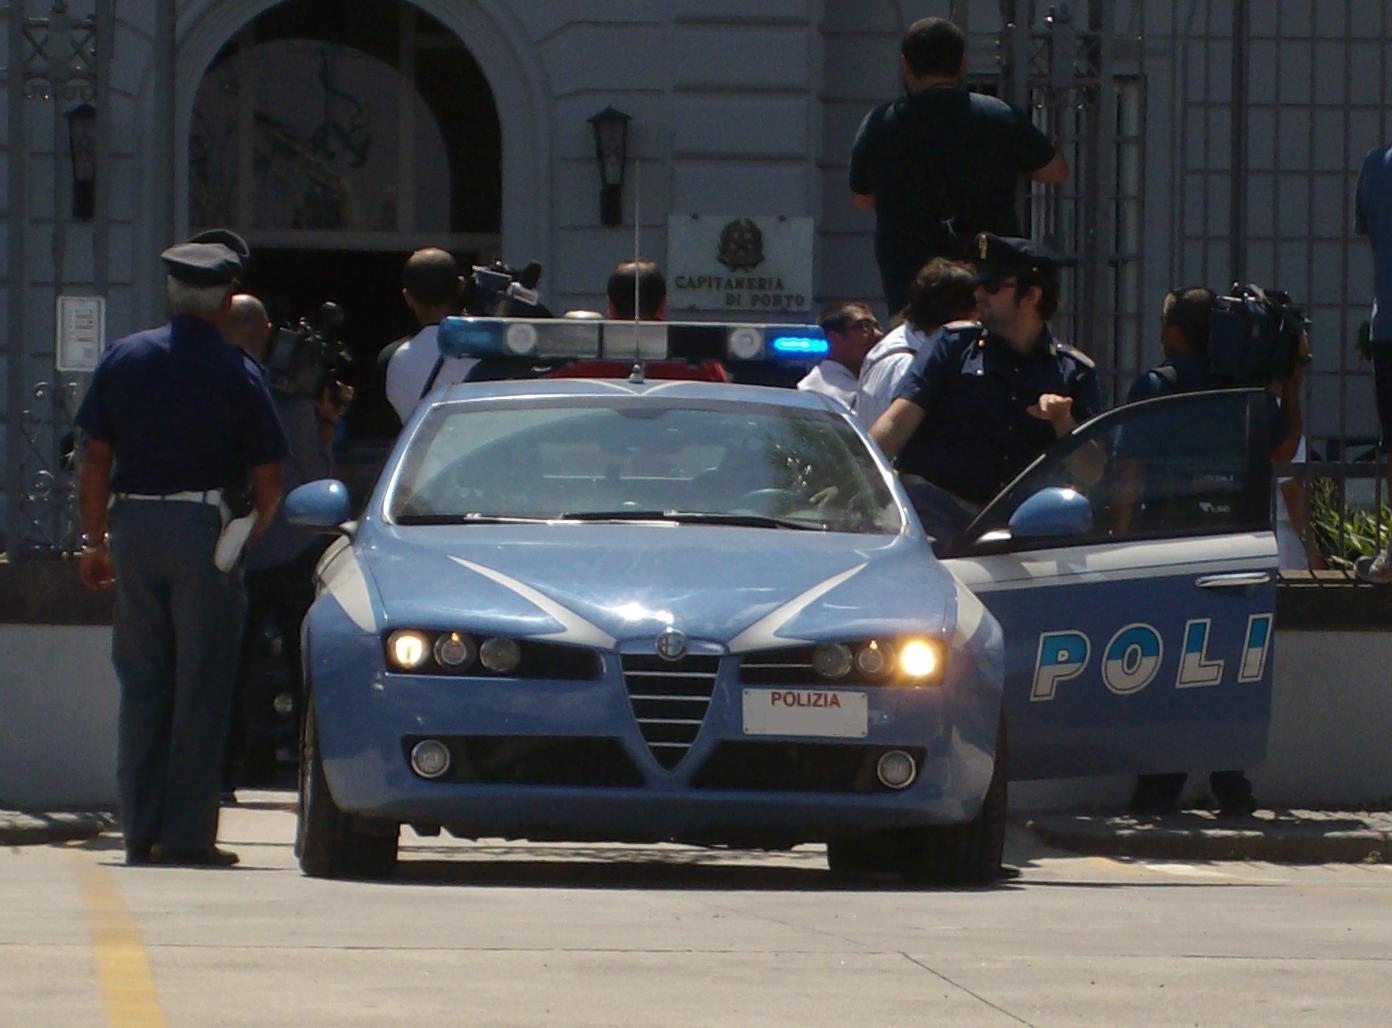 polizia-arresto-ALIM3885